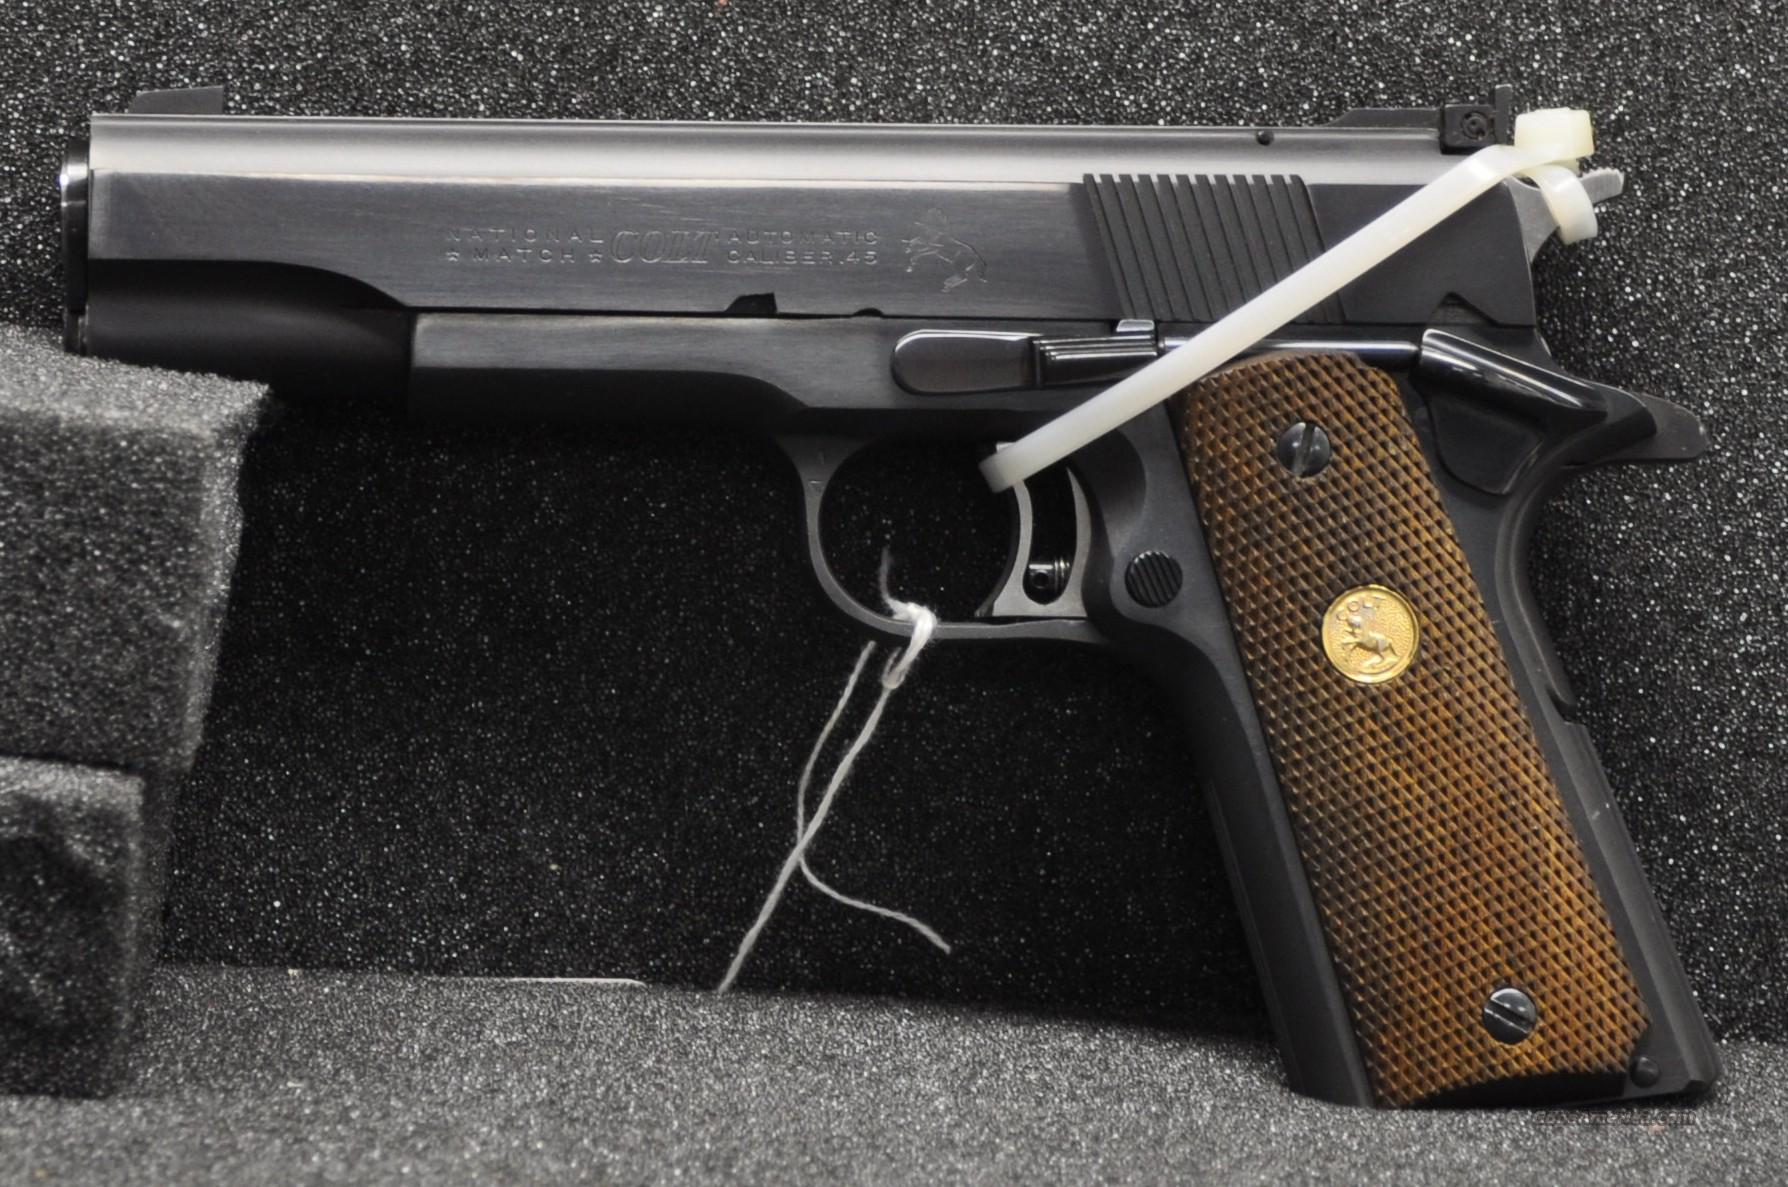 Colt National Match mfg in 1969  Guns > Pistols > Colt Automatic Pistols (1911 & Var)